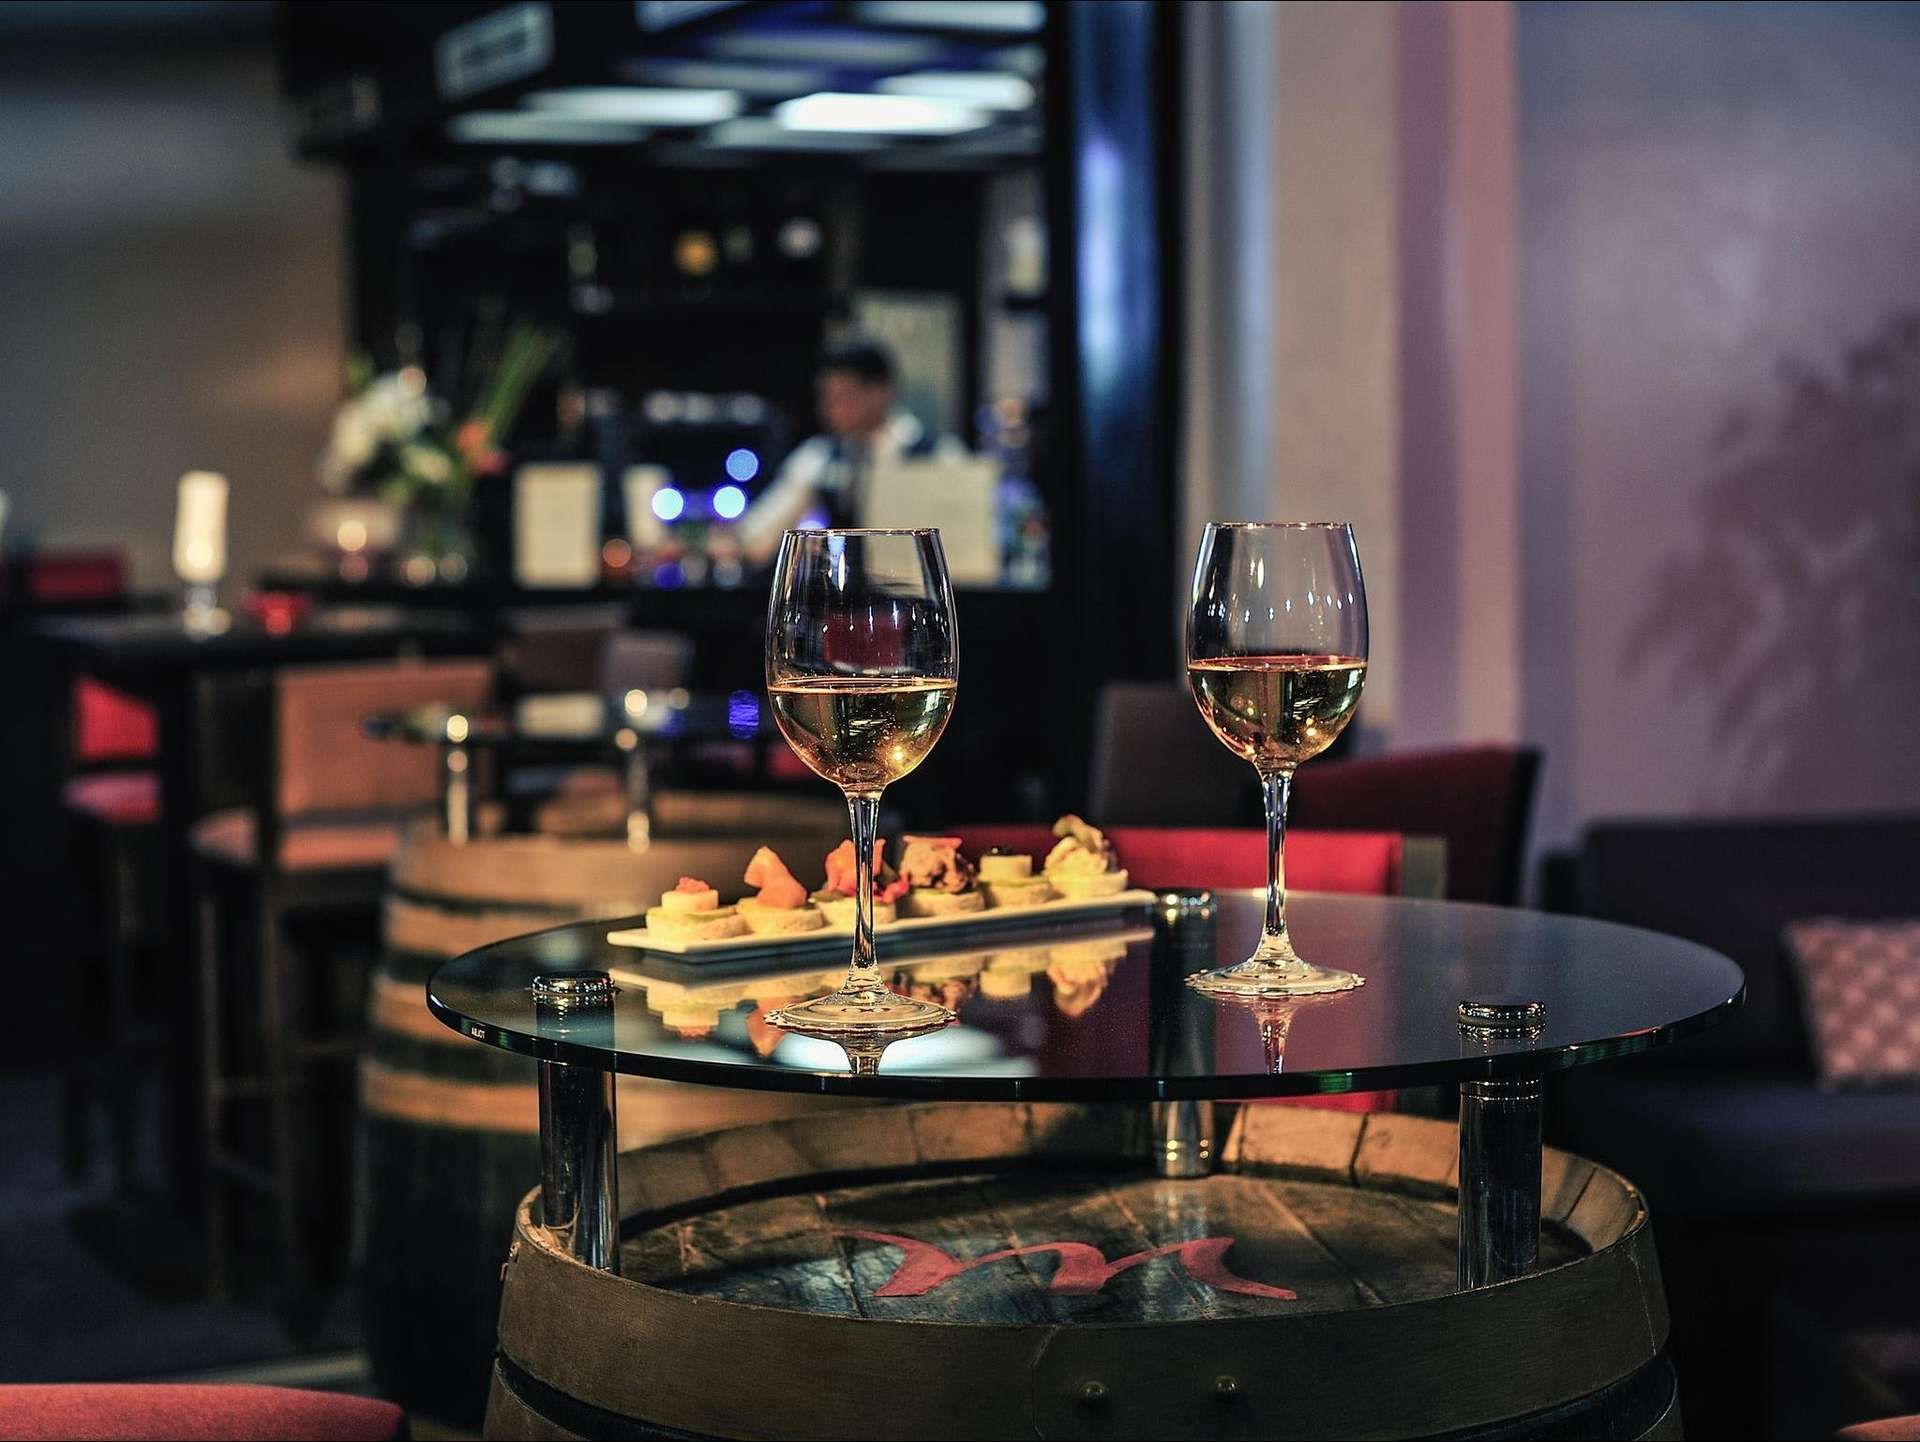 Hotel Mercure Sheherazade bar - Rabat